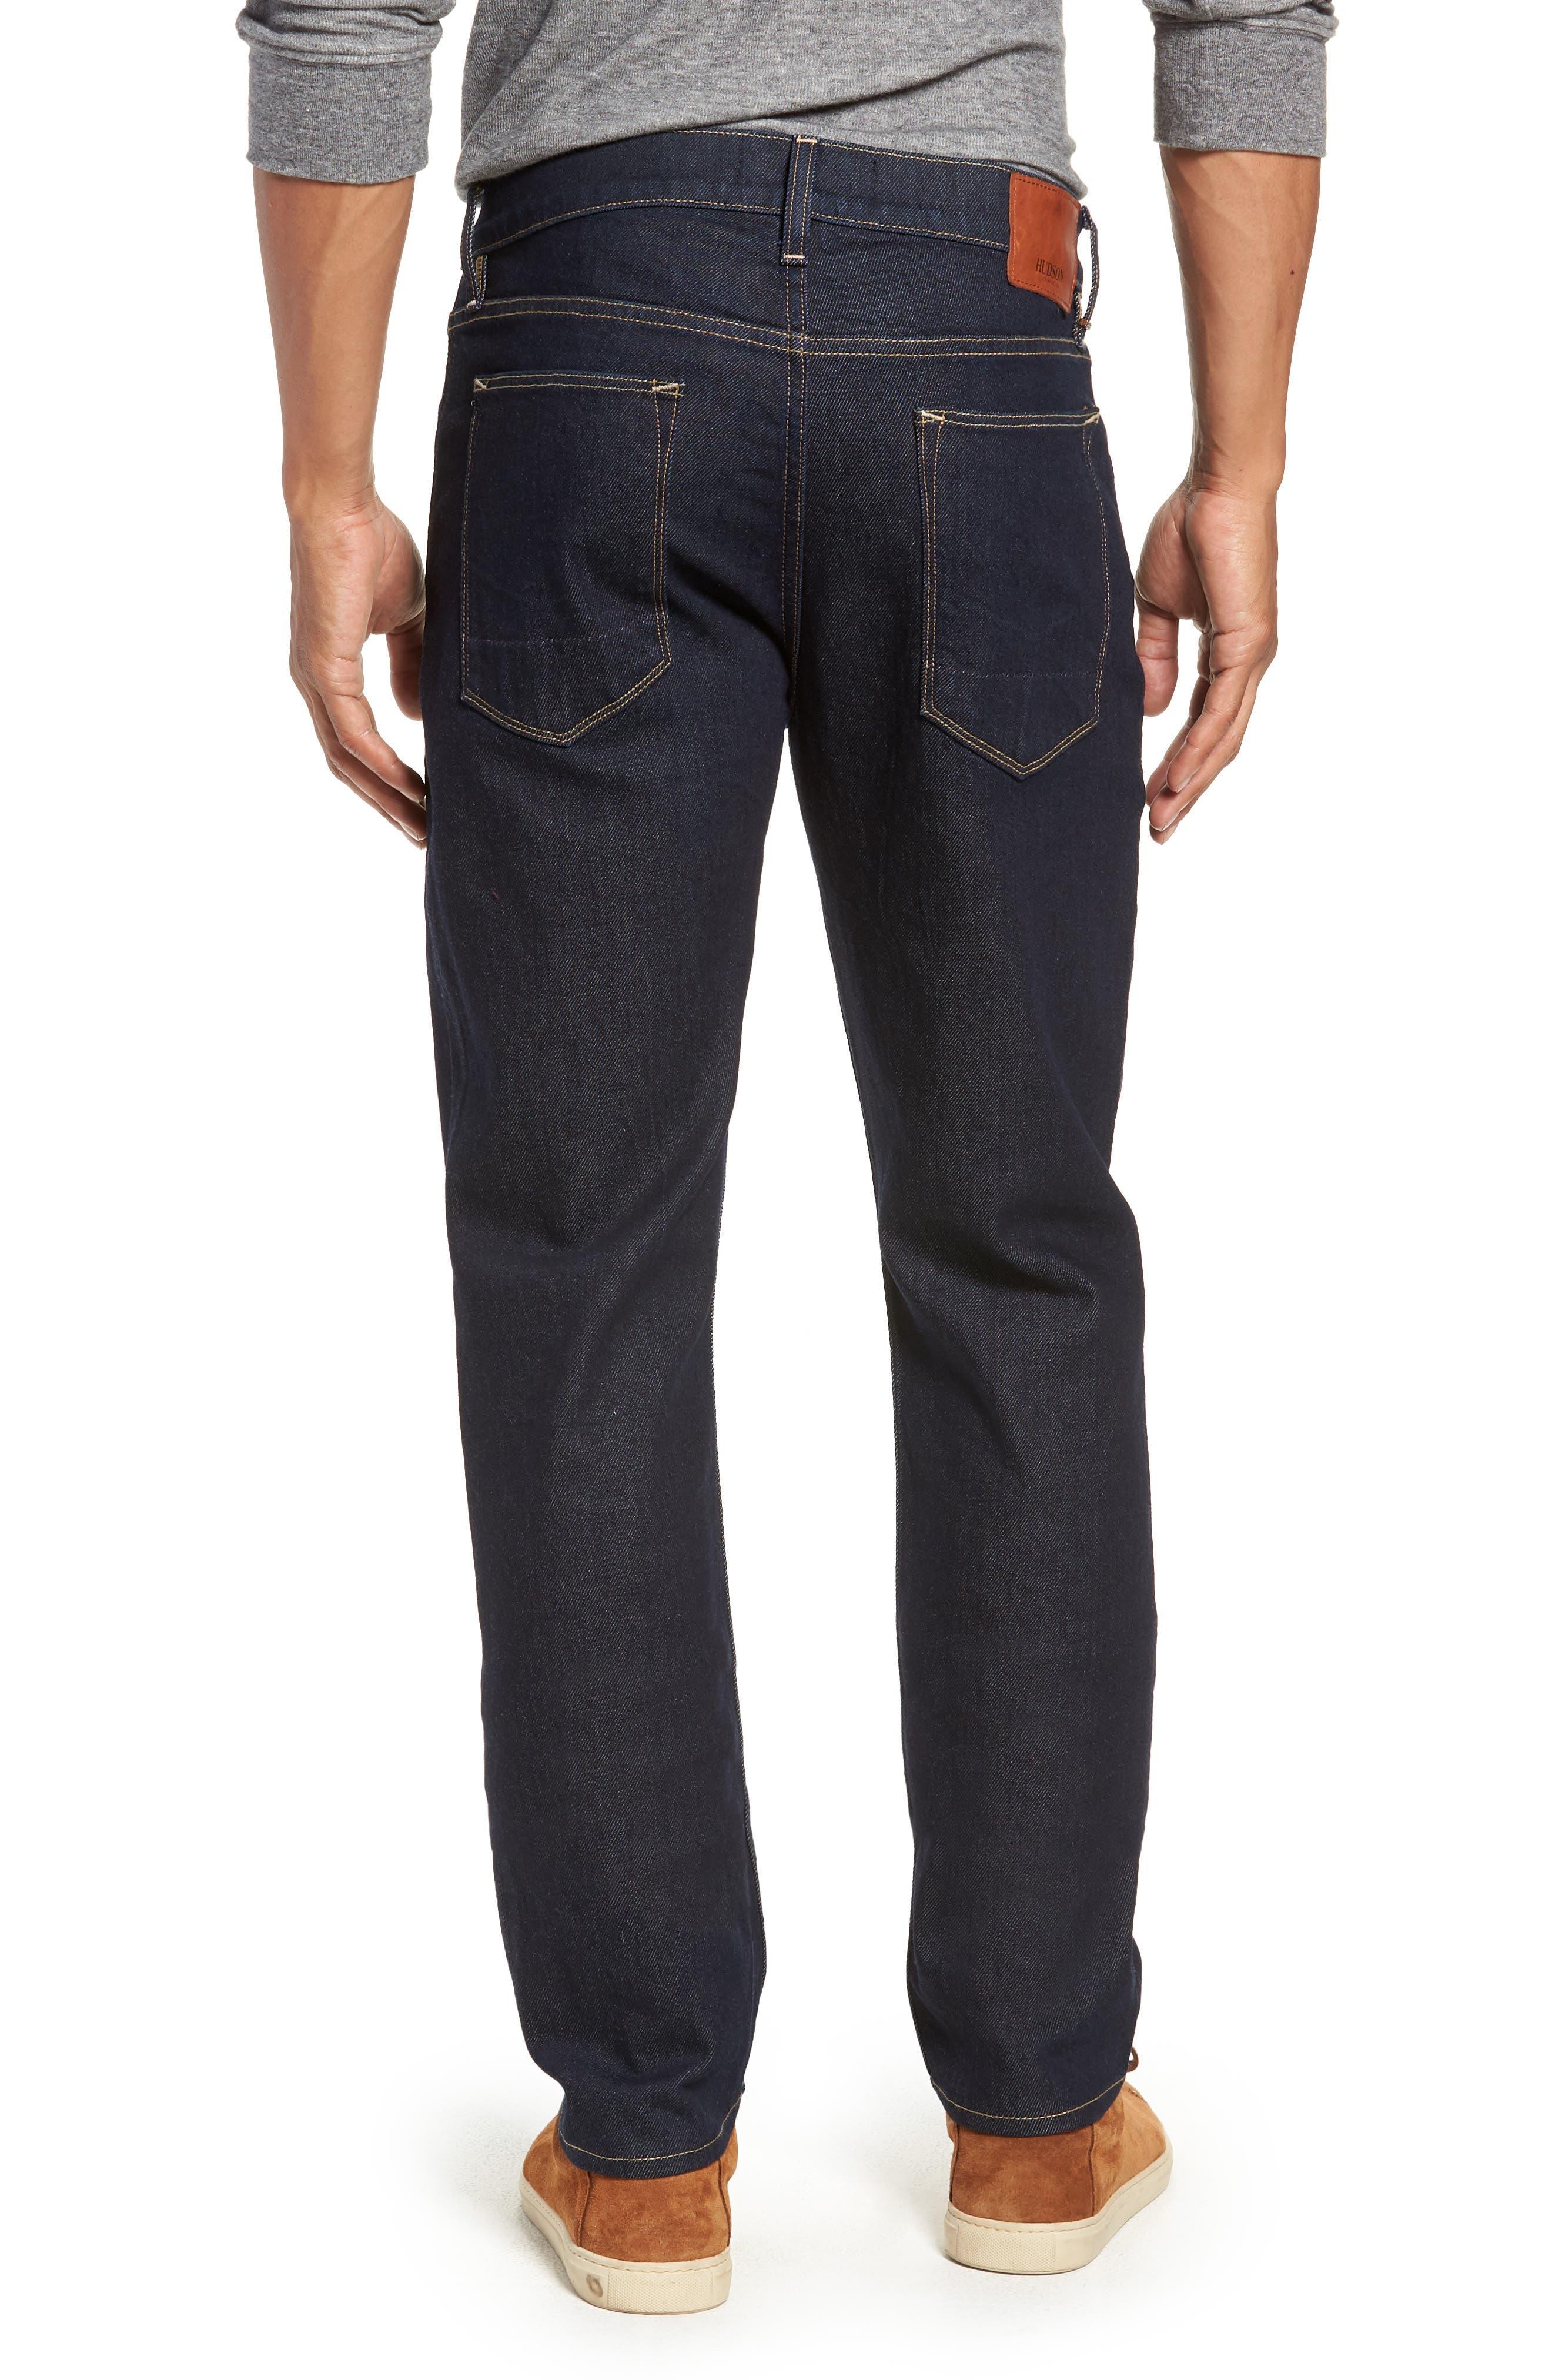 Blake Slim Fit Jeans,                             Alternate thumbnail 2, color,                             DUARTE